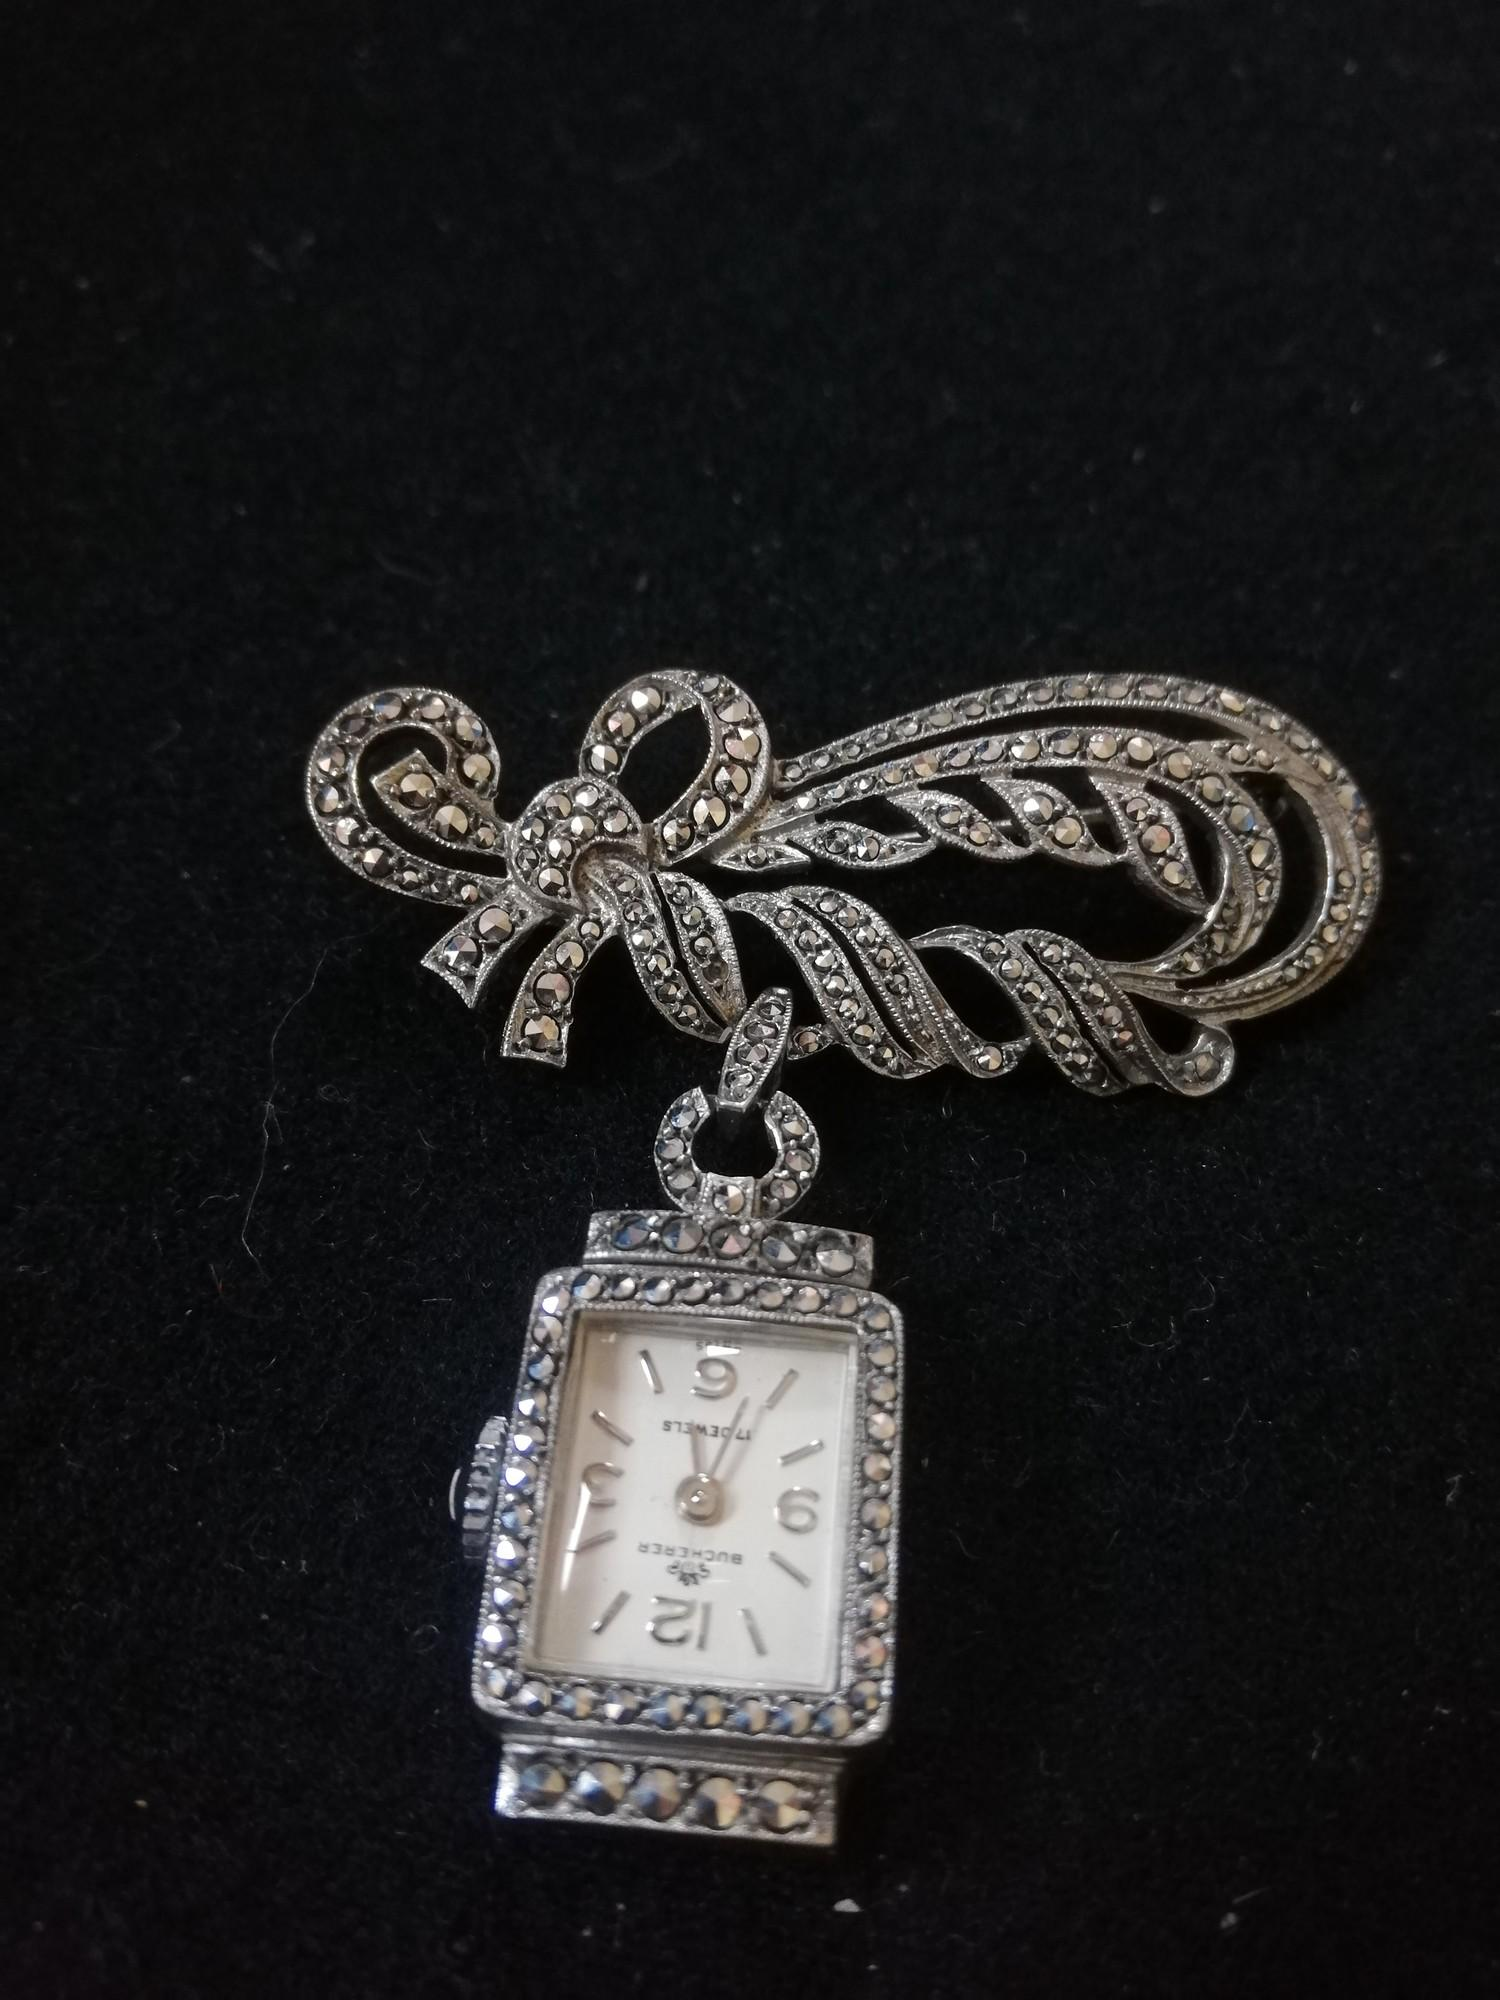 Ladies '800' silver marcasite brooch / watch by Bucherer